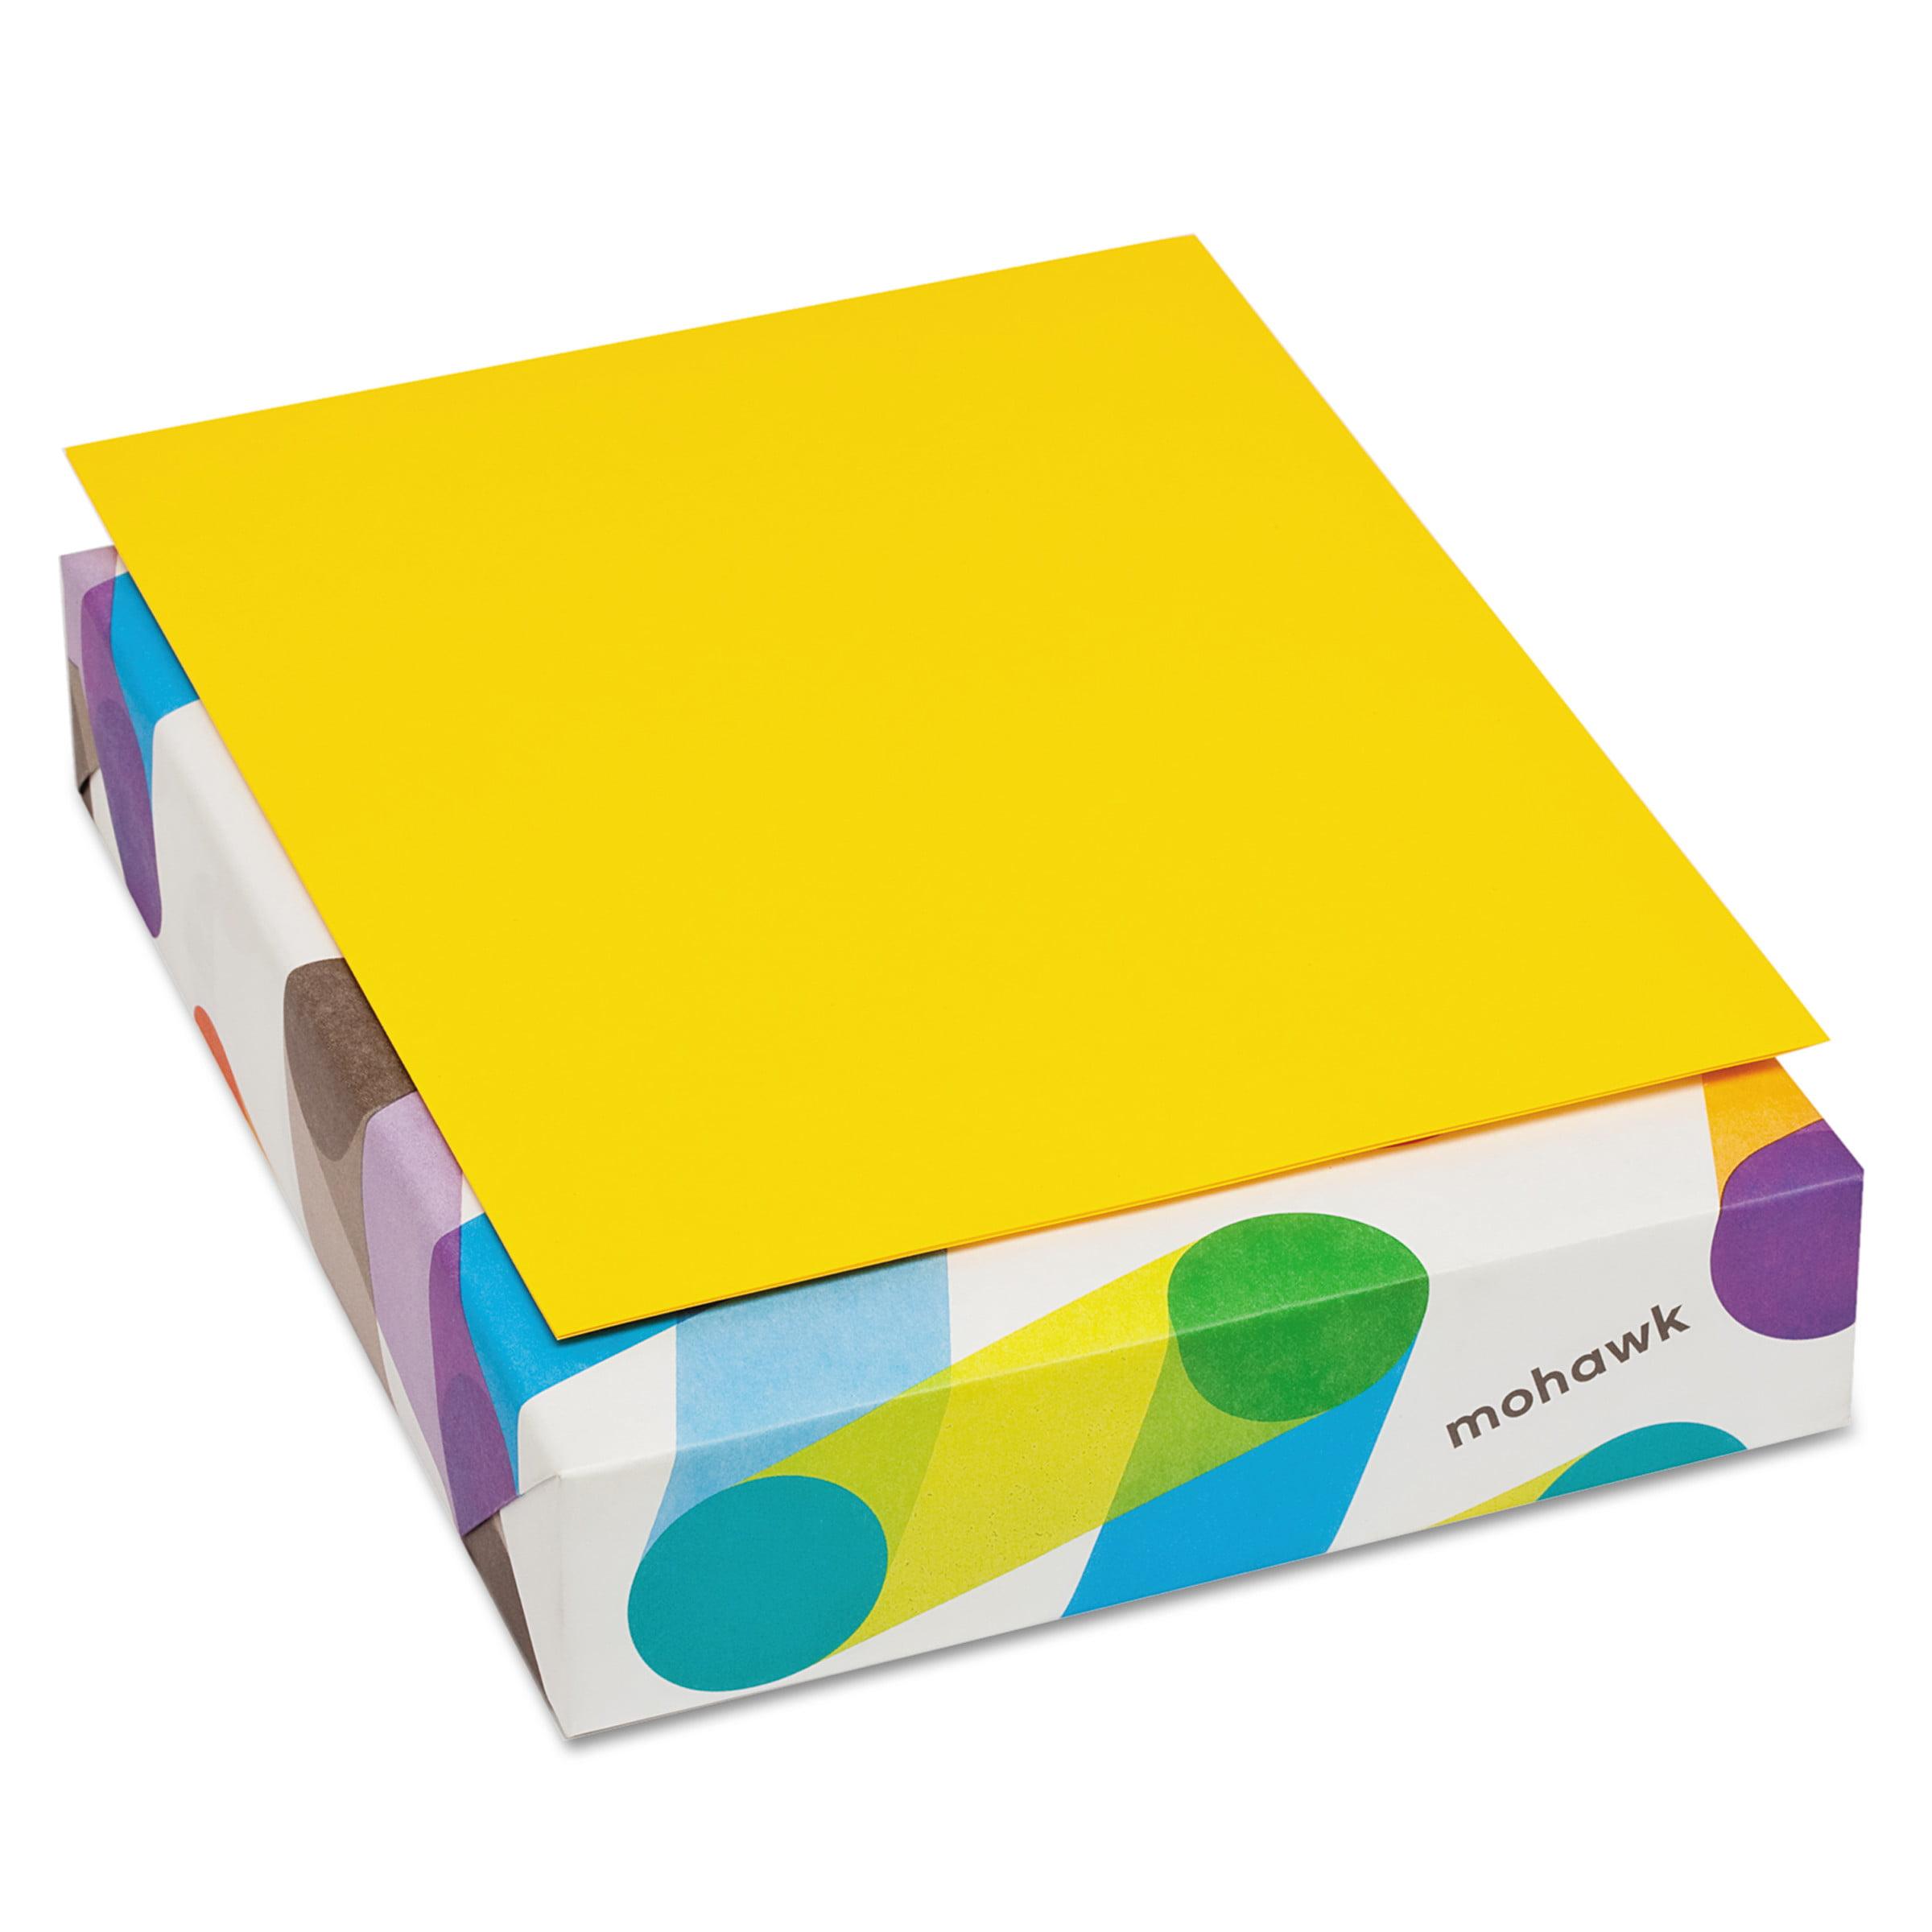 Mohawk BriteHue Multipurpose Colored Paper, 20lb, 8 1/2 x 11, Sun Yellow, 500 Sheets -MOW472808